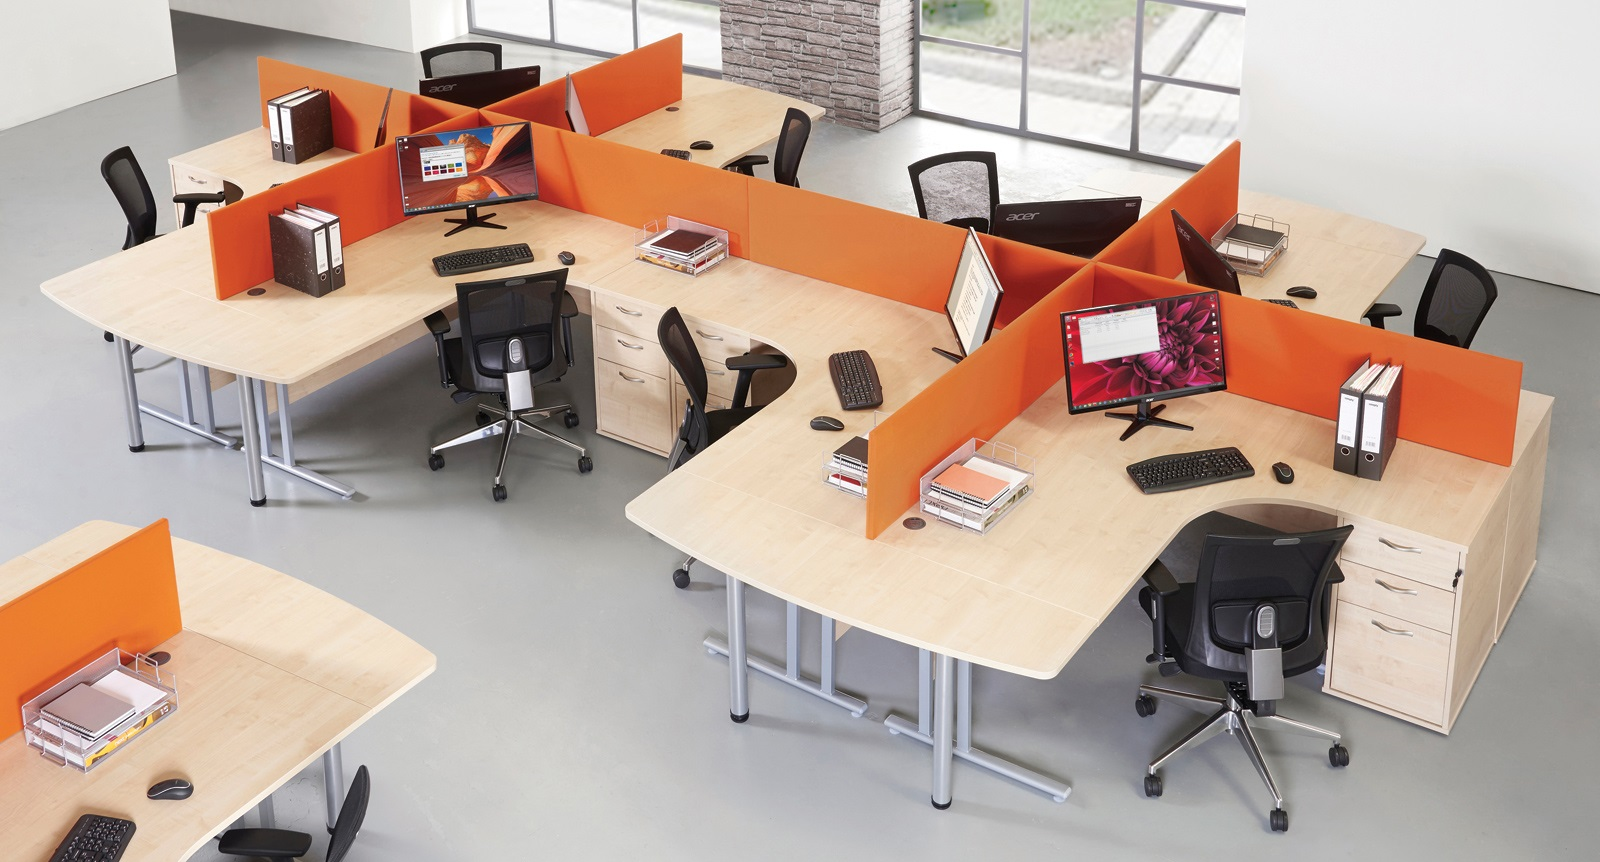 office desk divider. Office Desk Divider. Divider L I